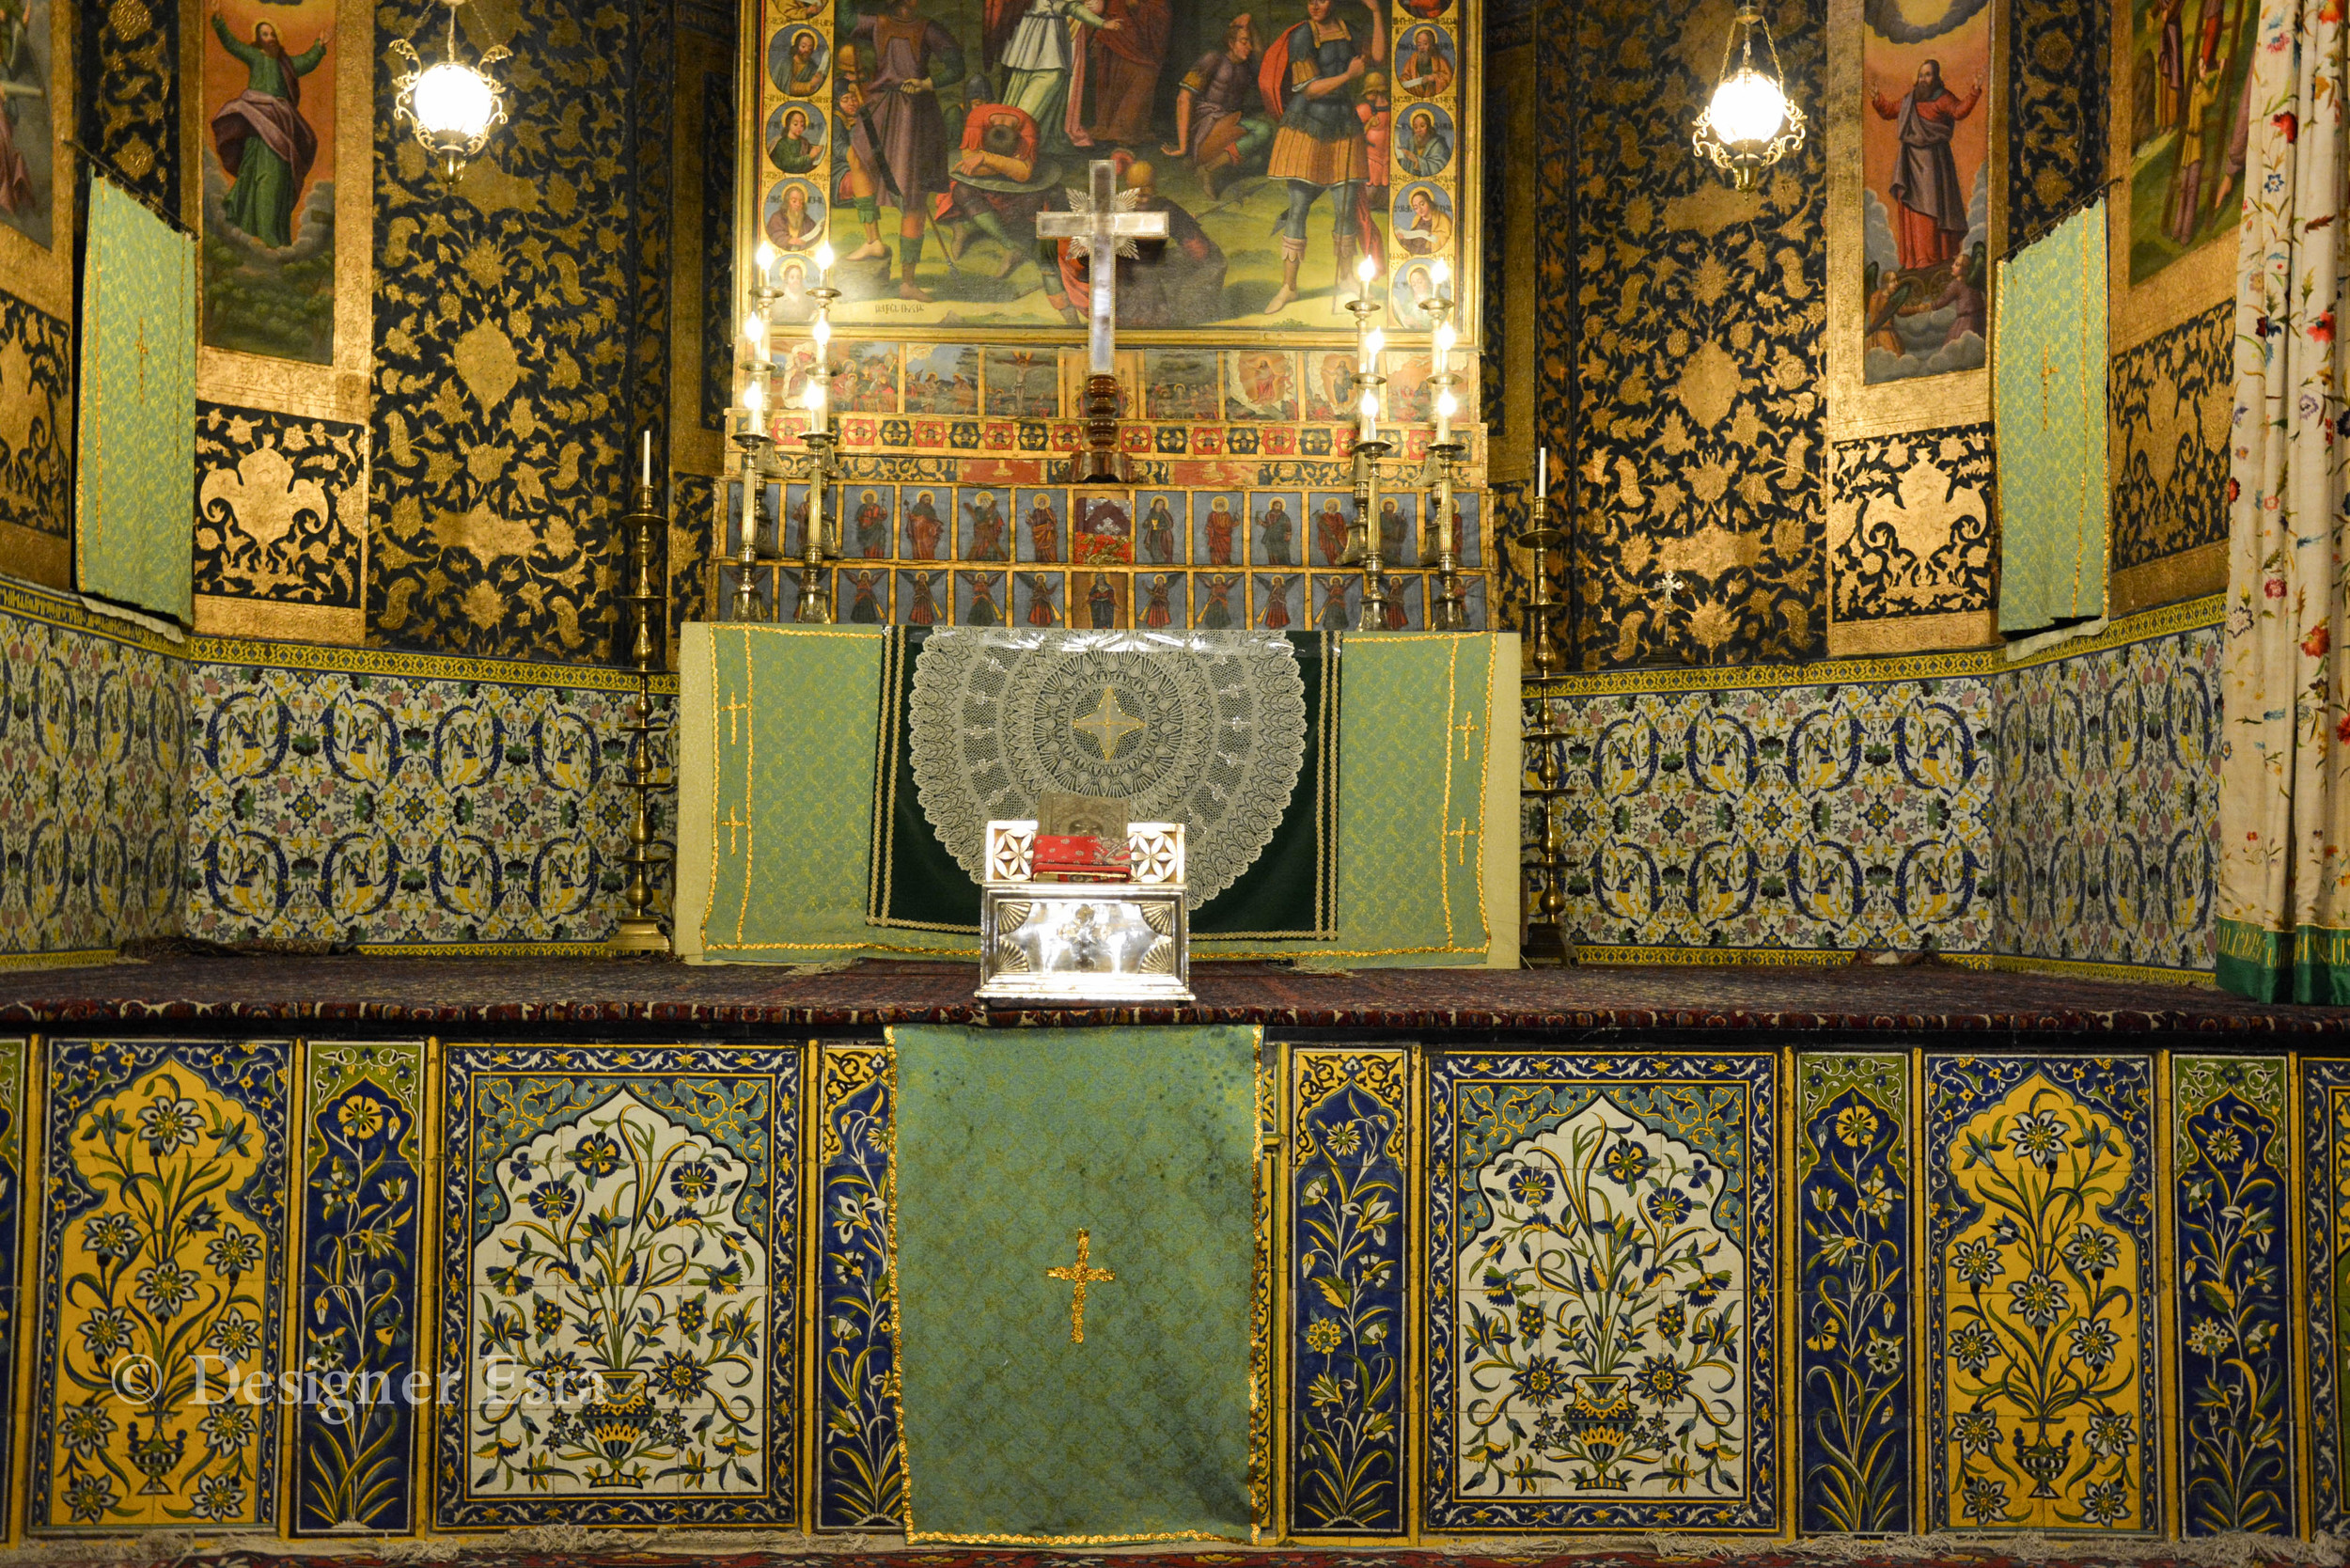 Persian Christian Biomorphic Patterns in Iran